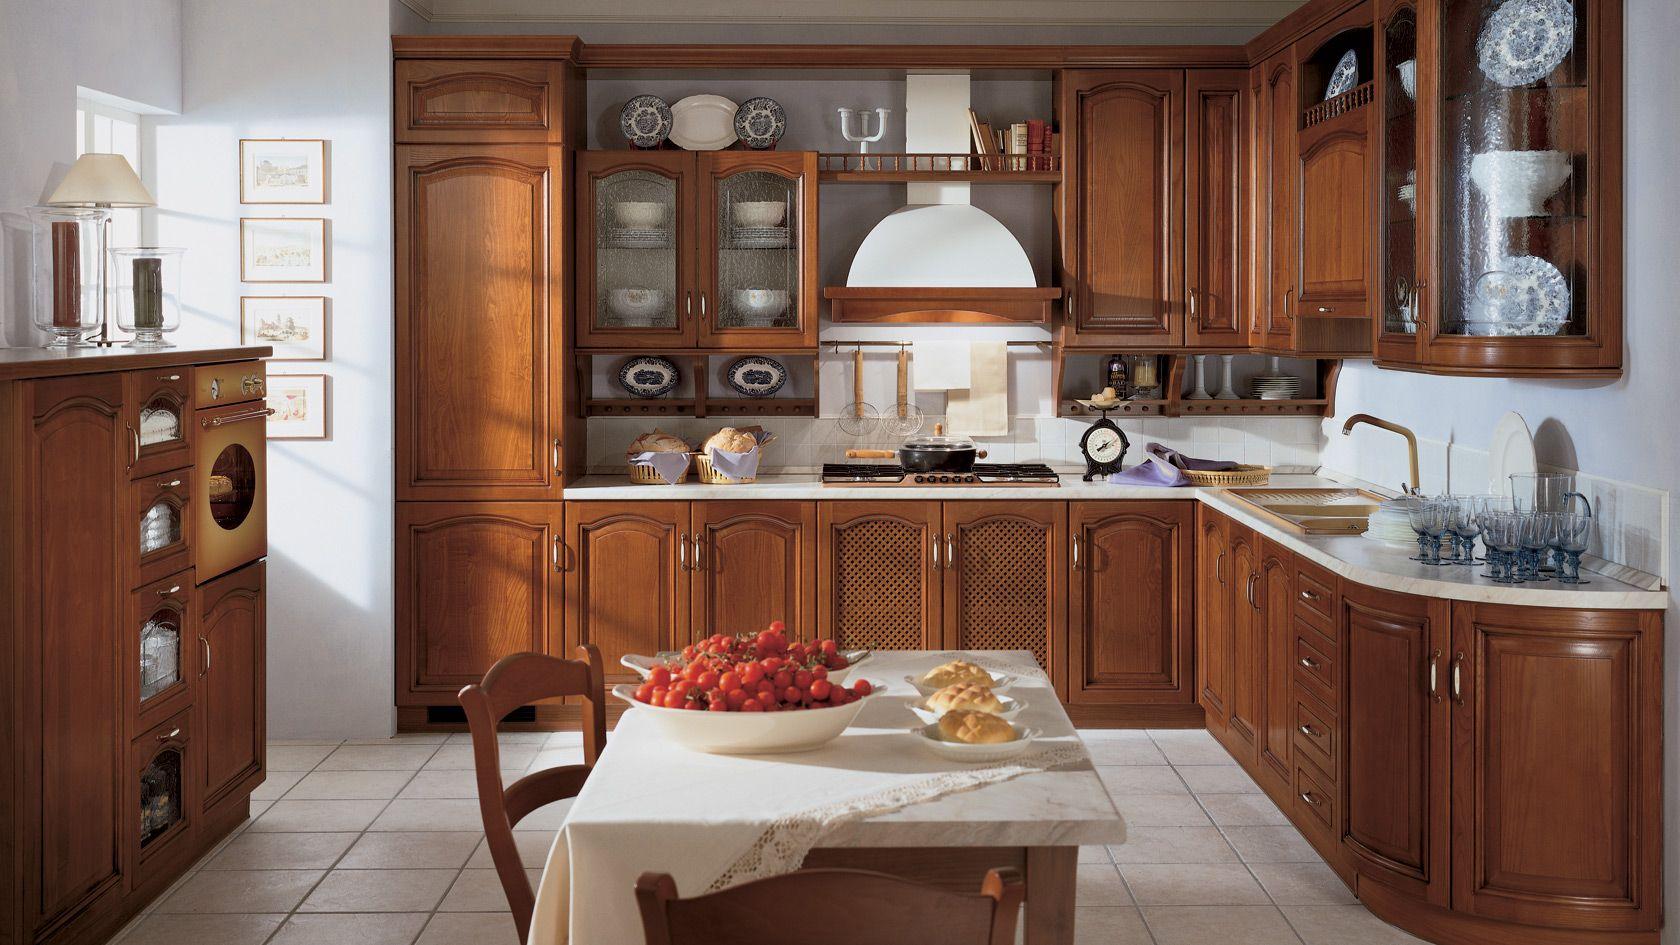 Cucina Margot Scavolini | look. | Idee per la cucina, Cucine ...